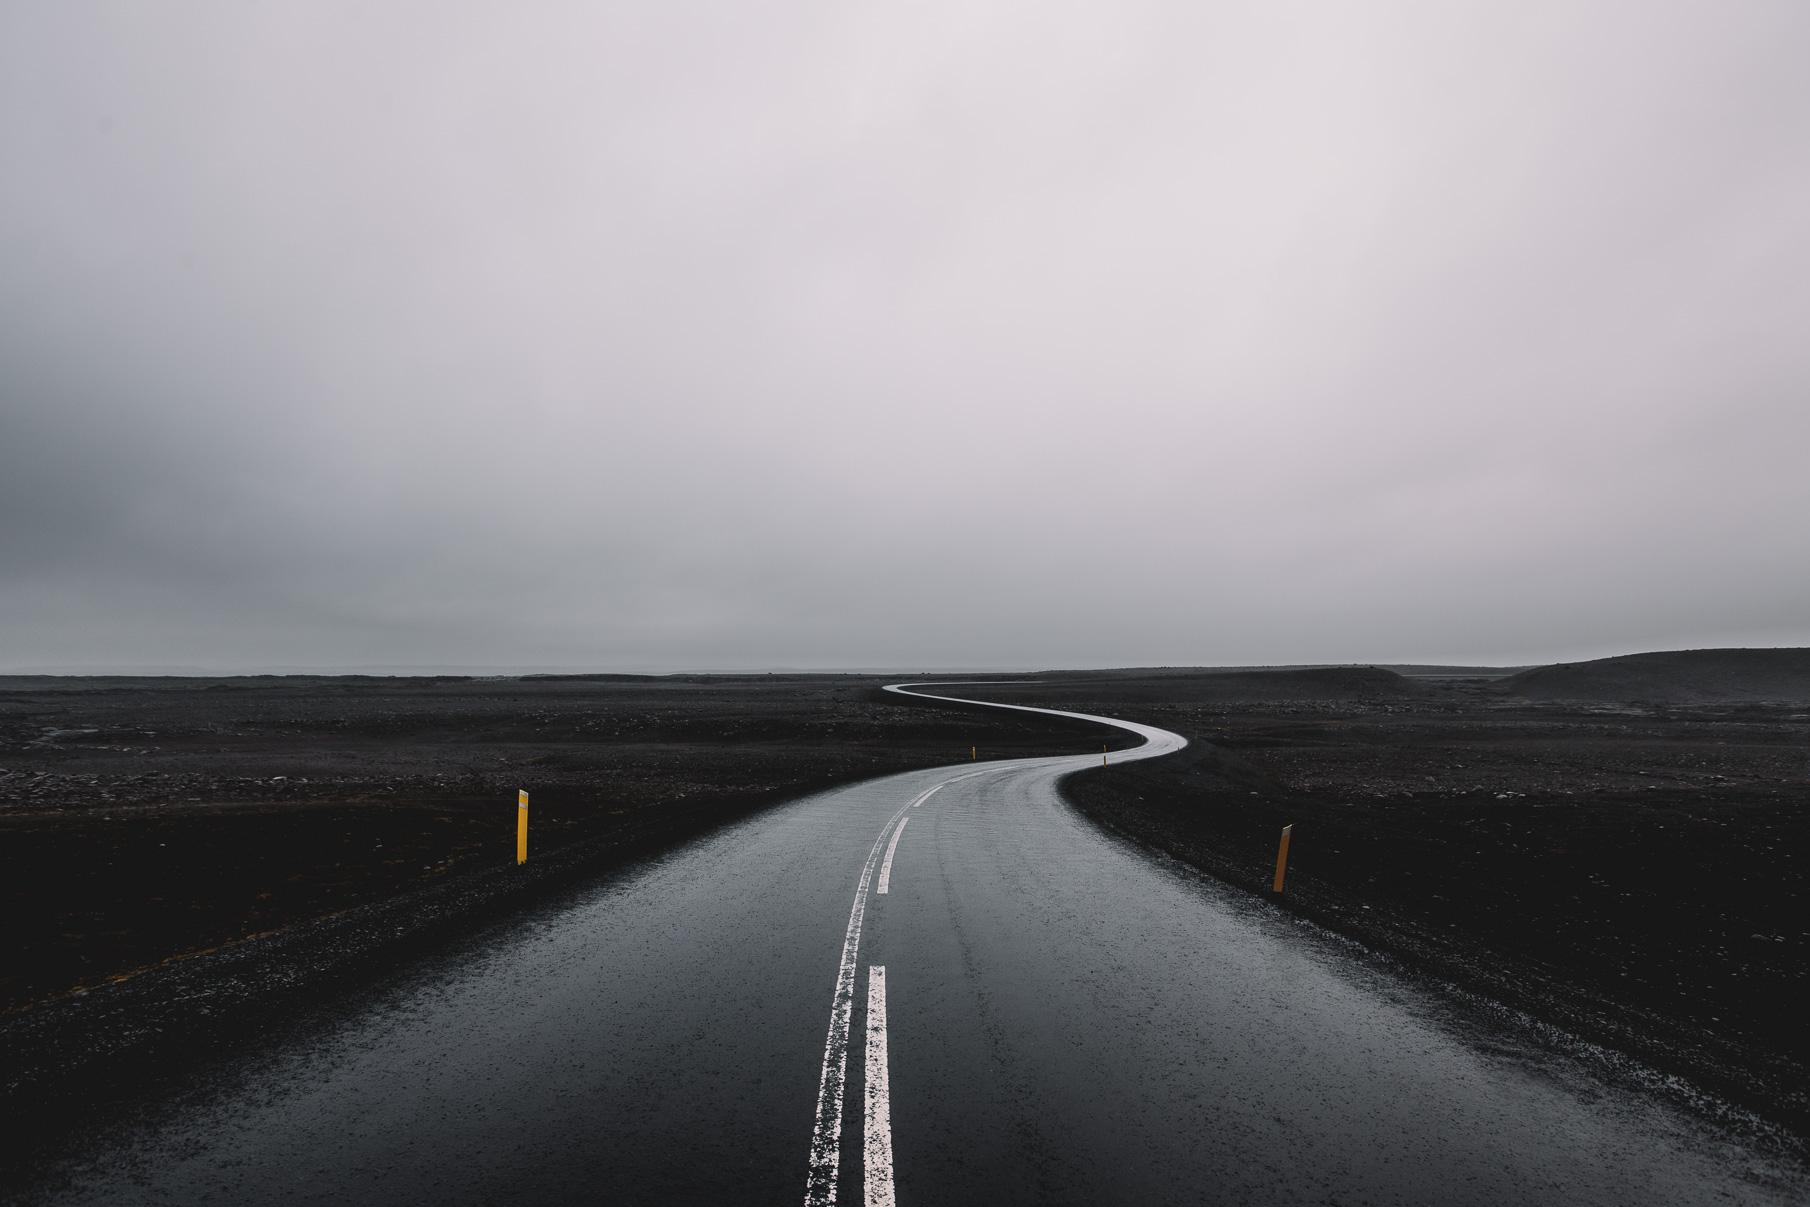 road-001_o.jpg